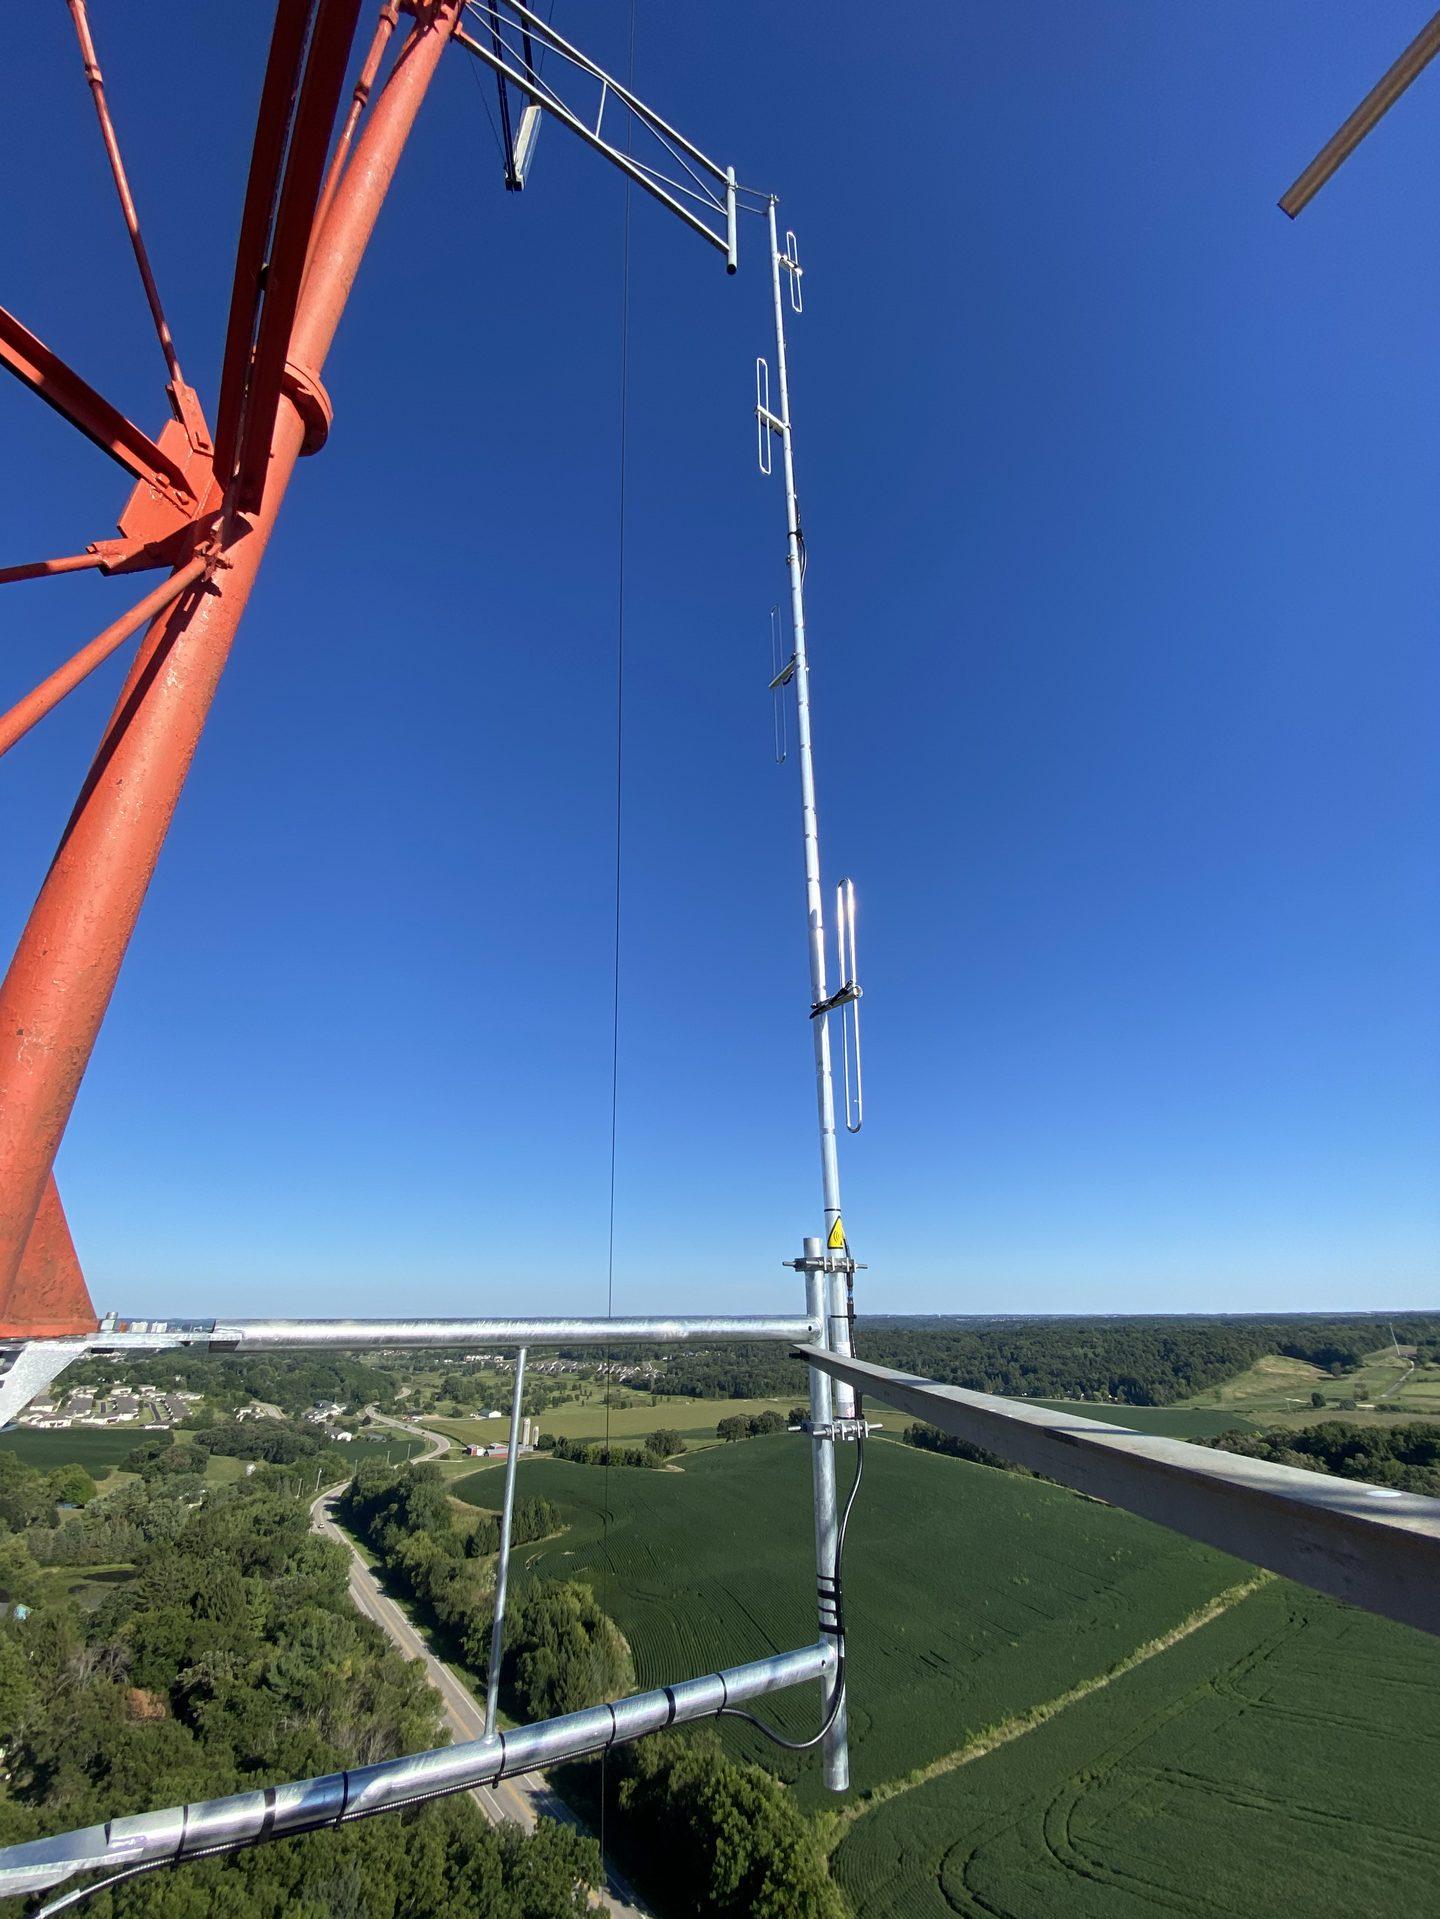 820 Repeater Antenna